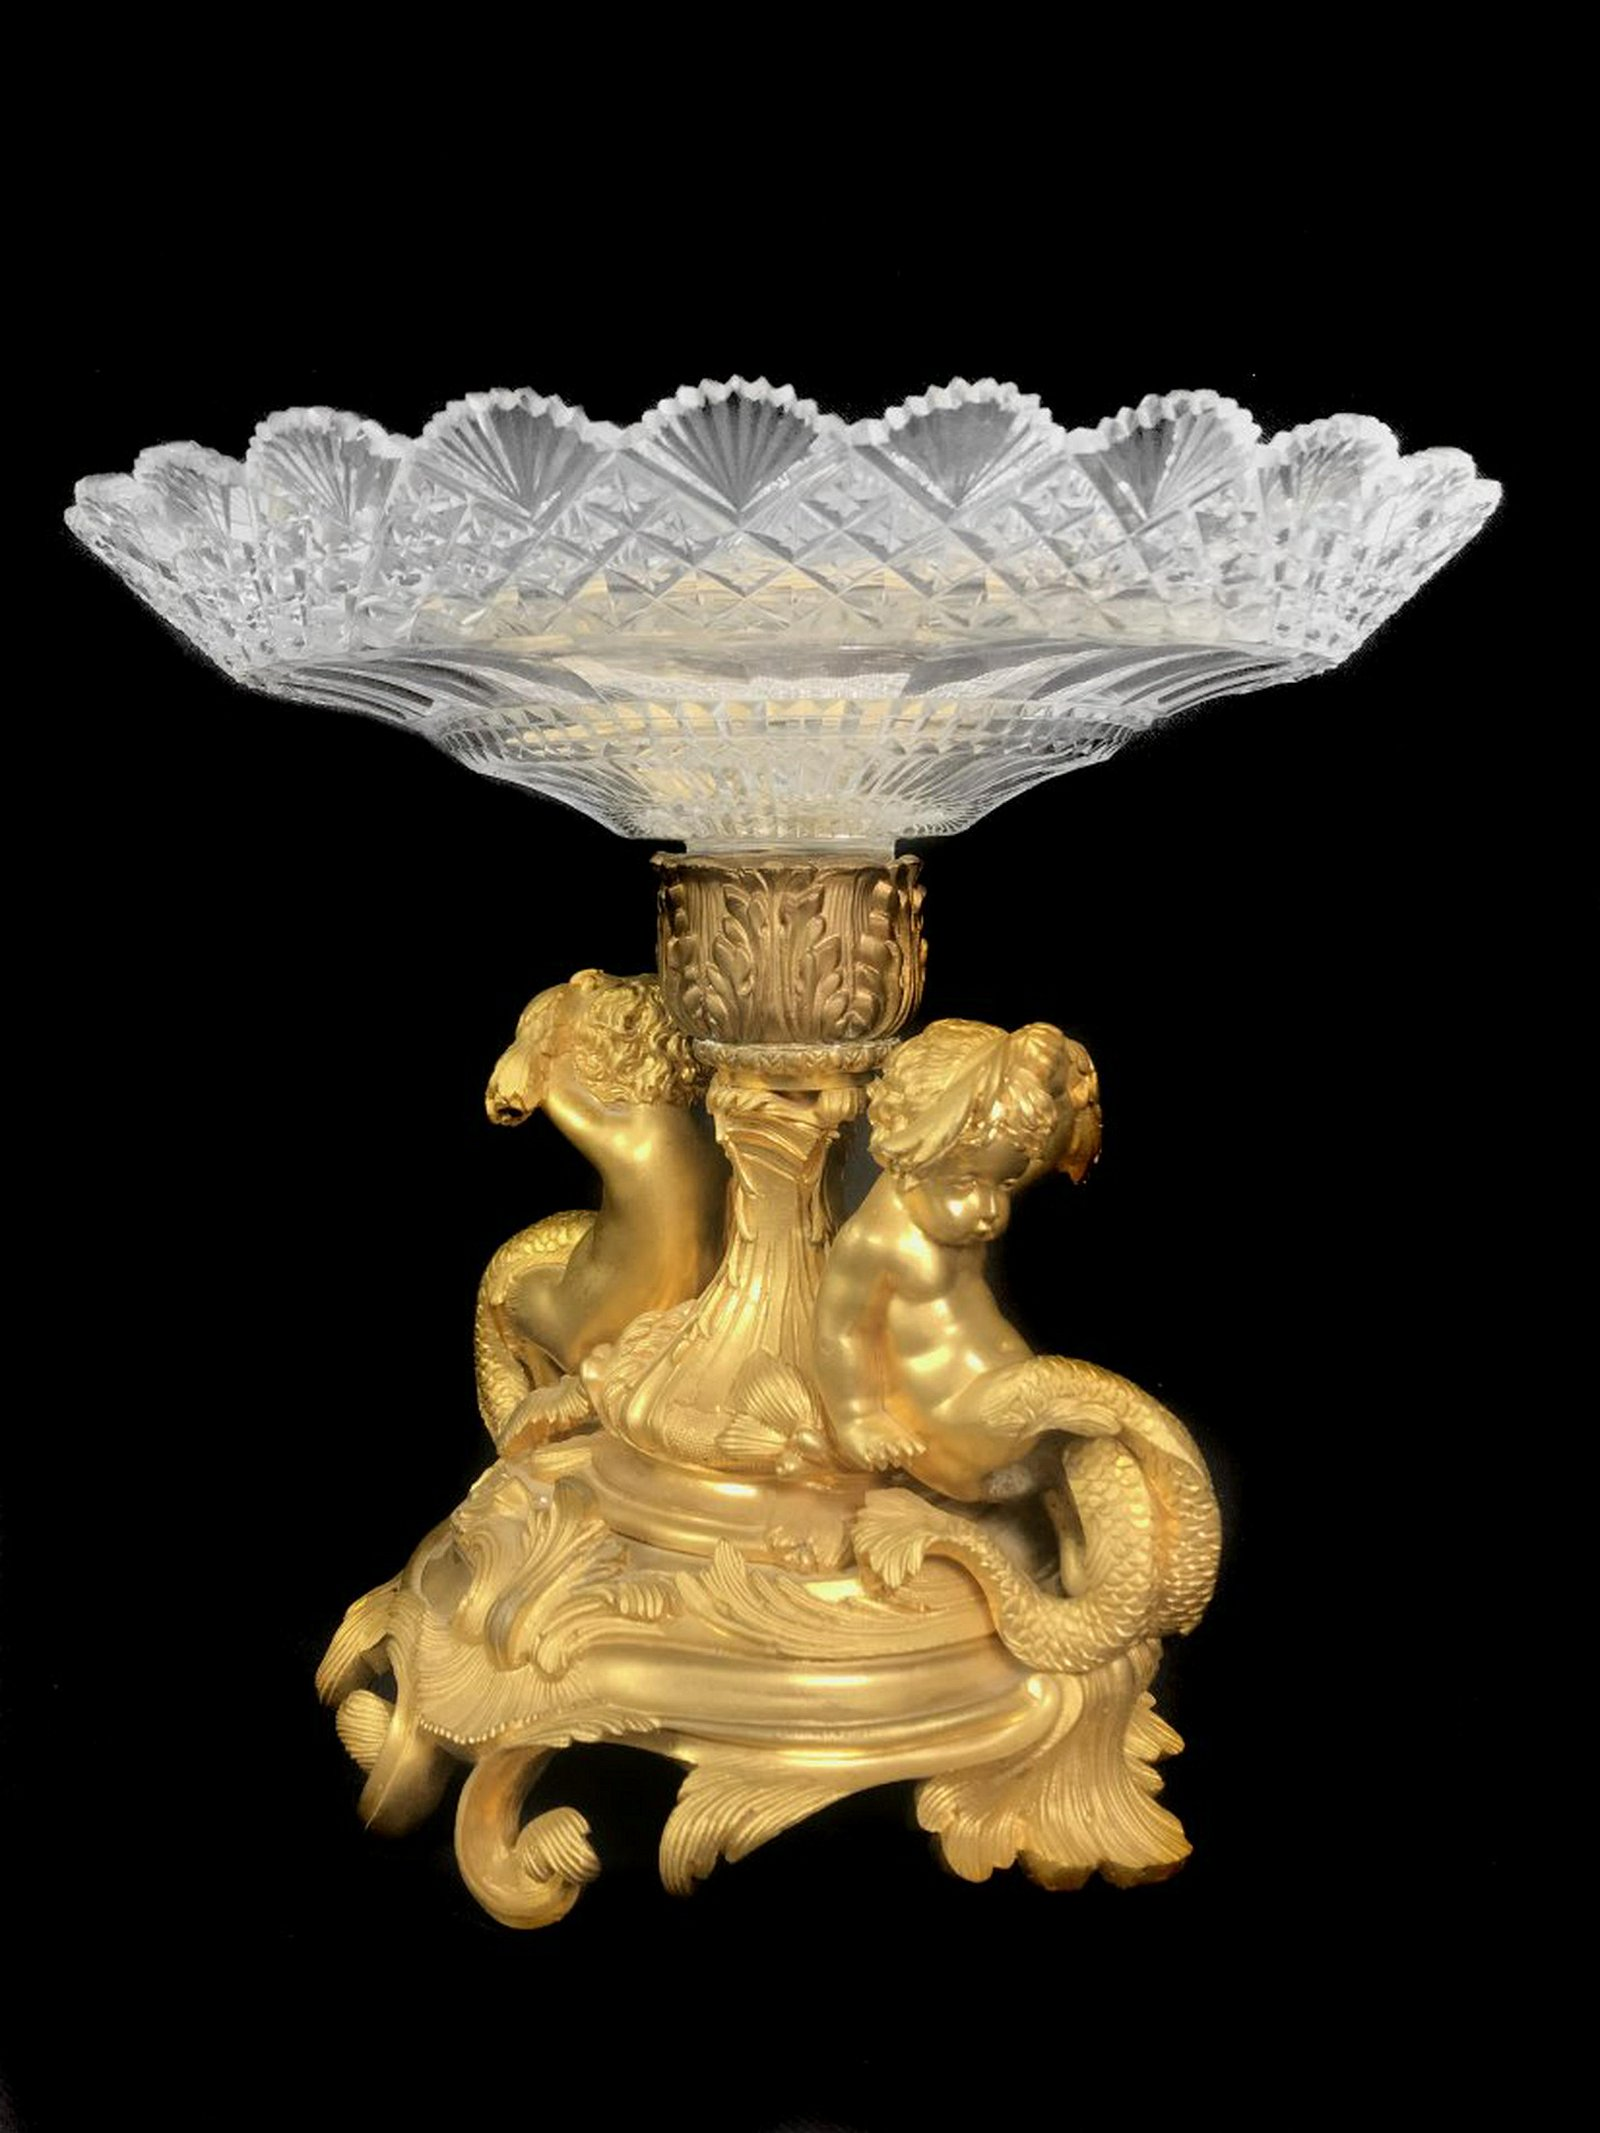 A Napoleon III style gilt-bronze figural centerpiece